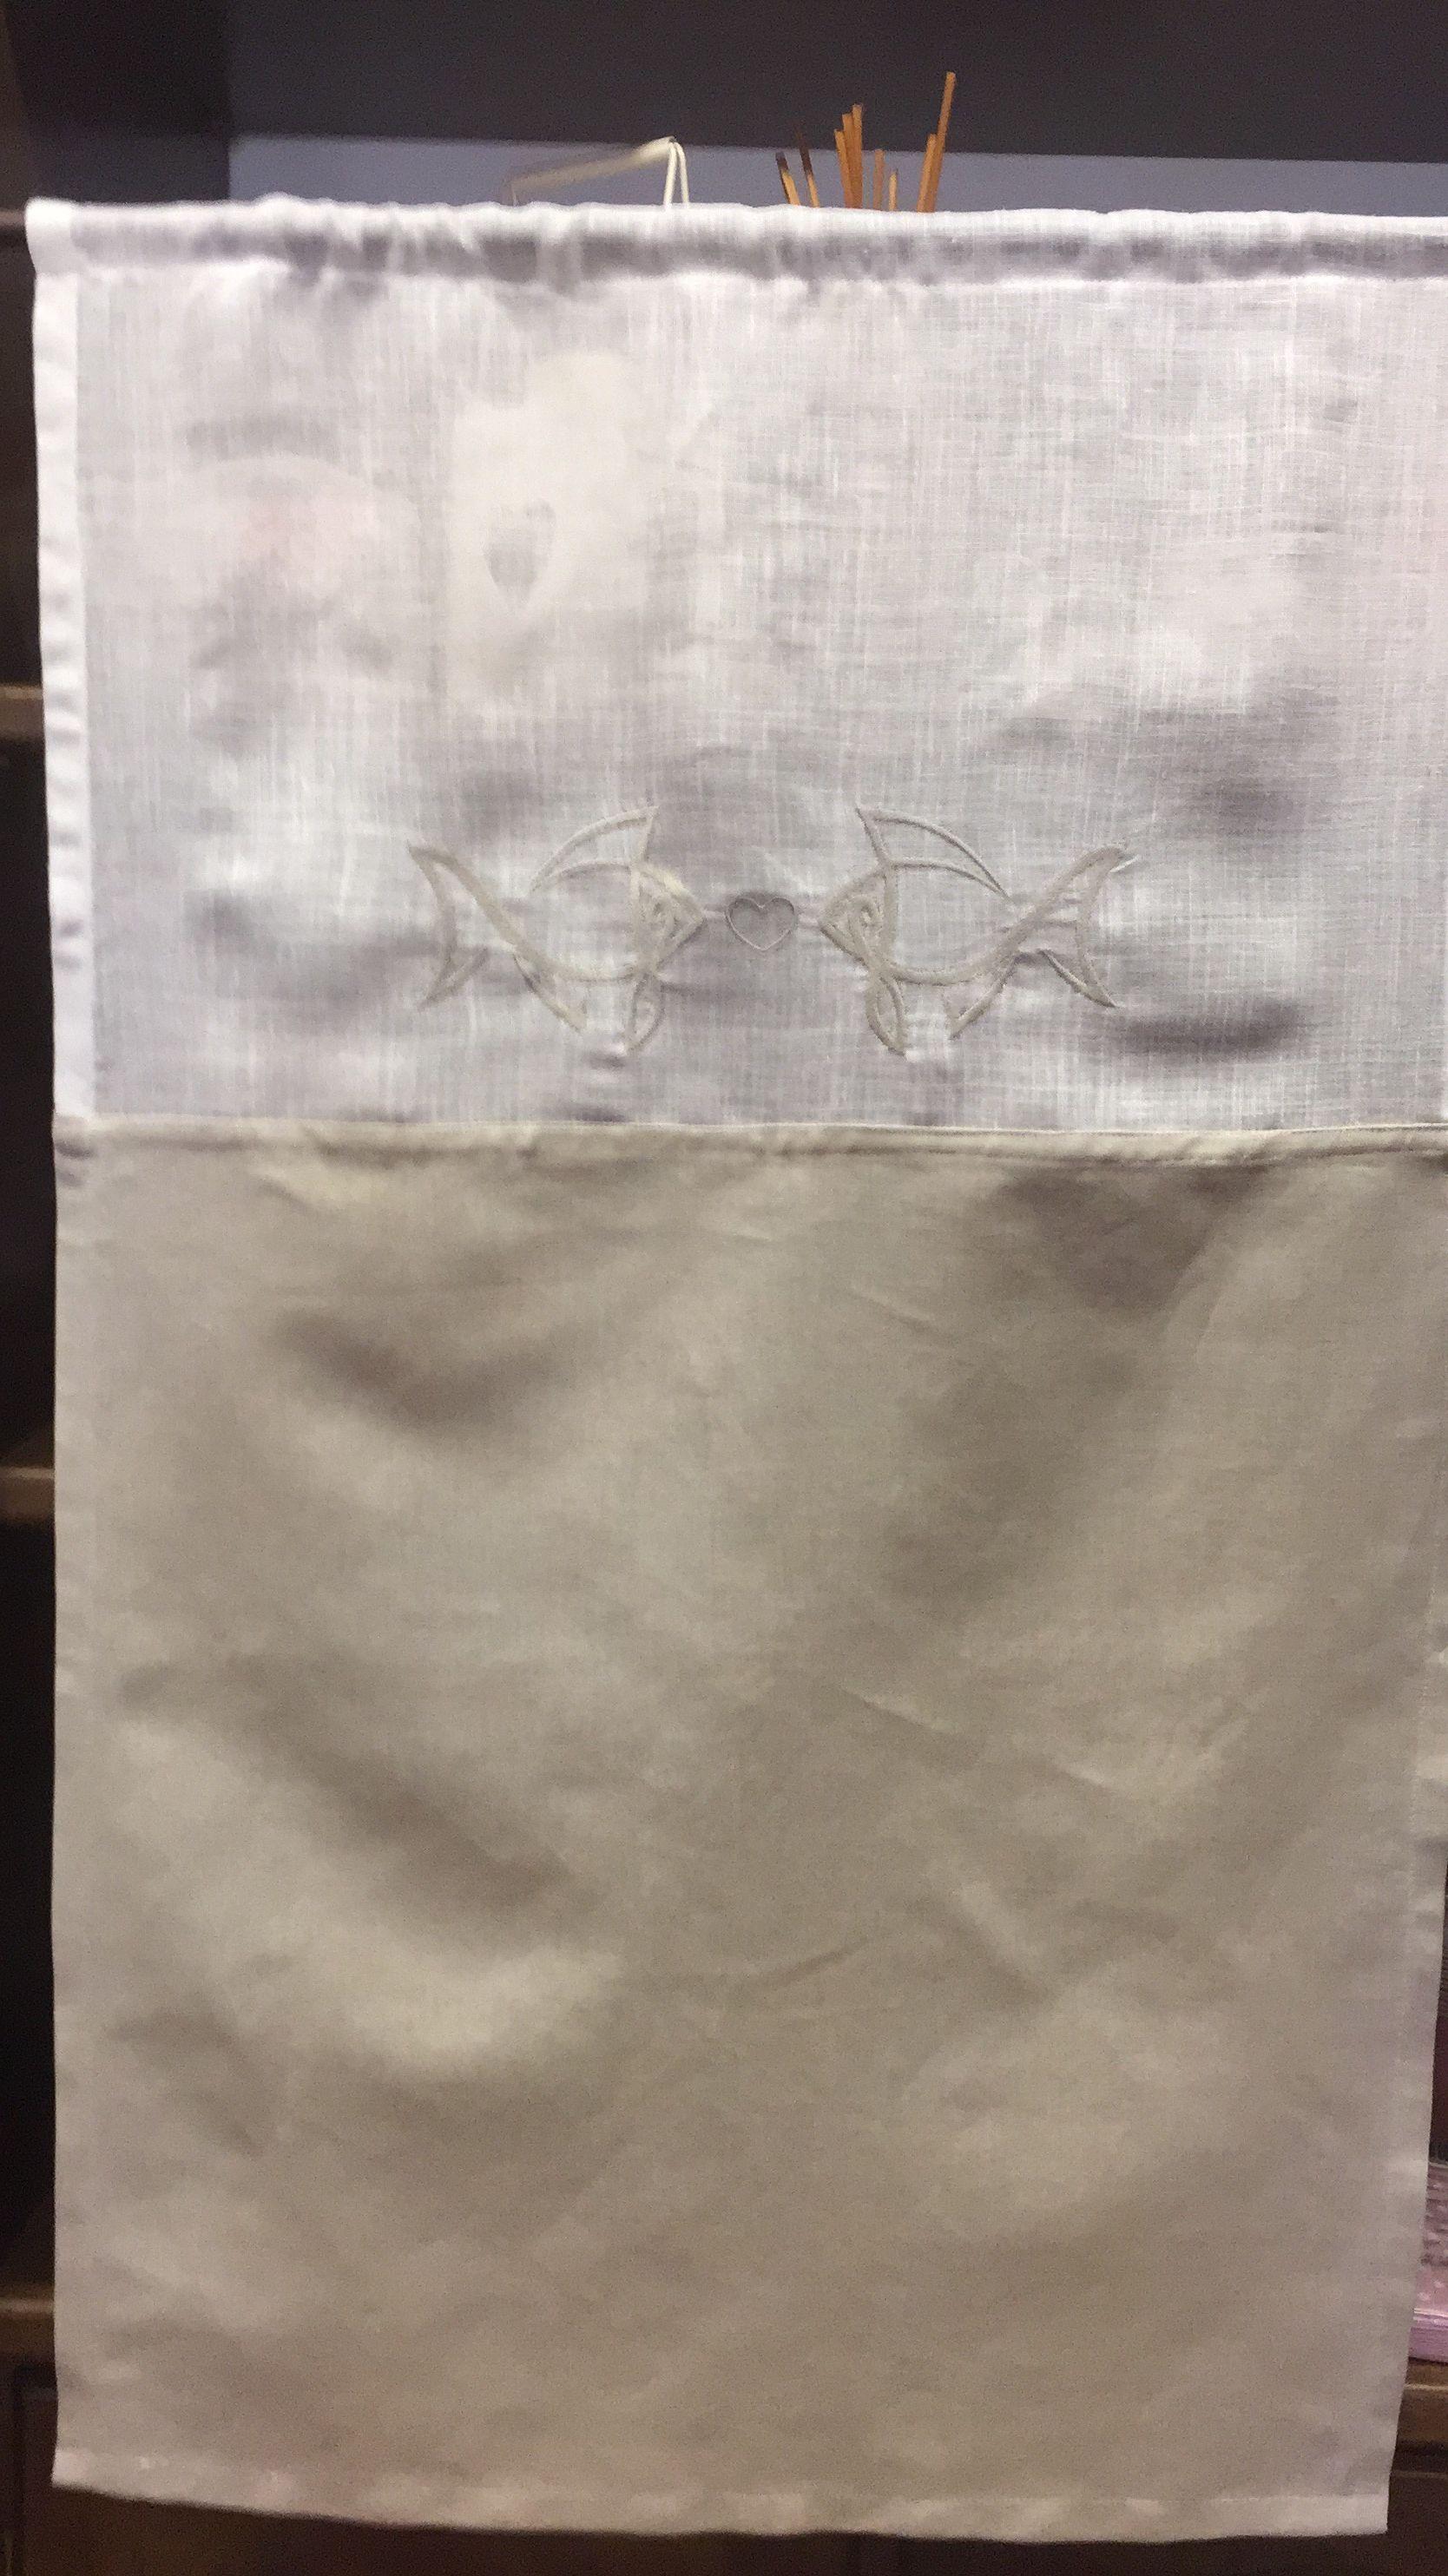 Tendina Bagno ~ Tenda bagno con pesciolini ricamati le pleisì de pacou tende le